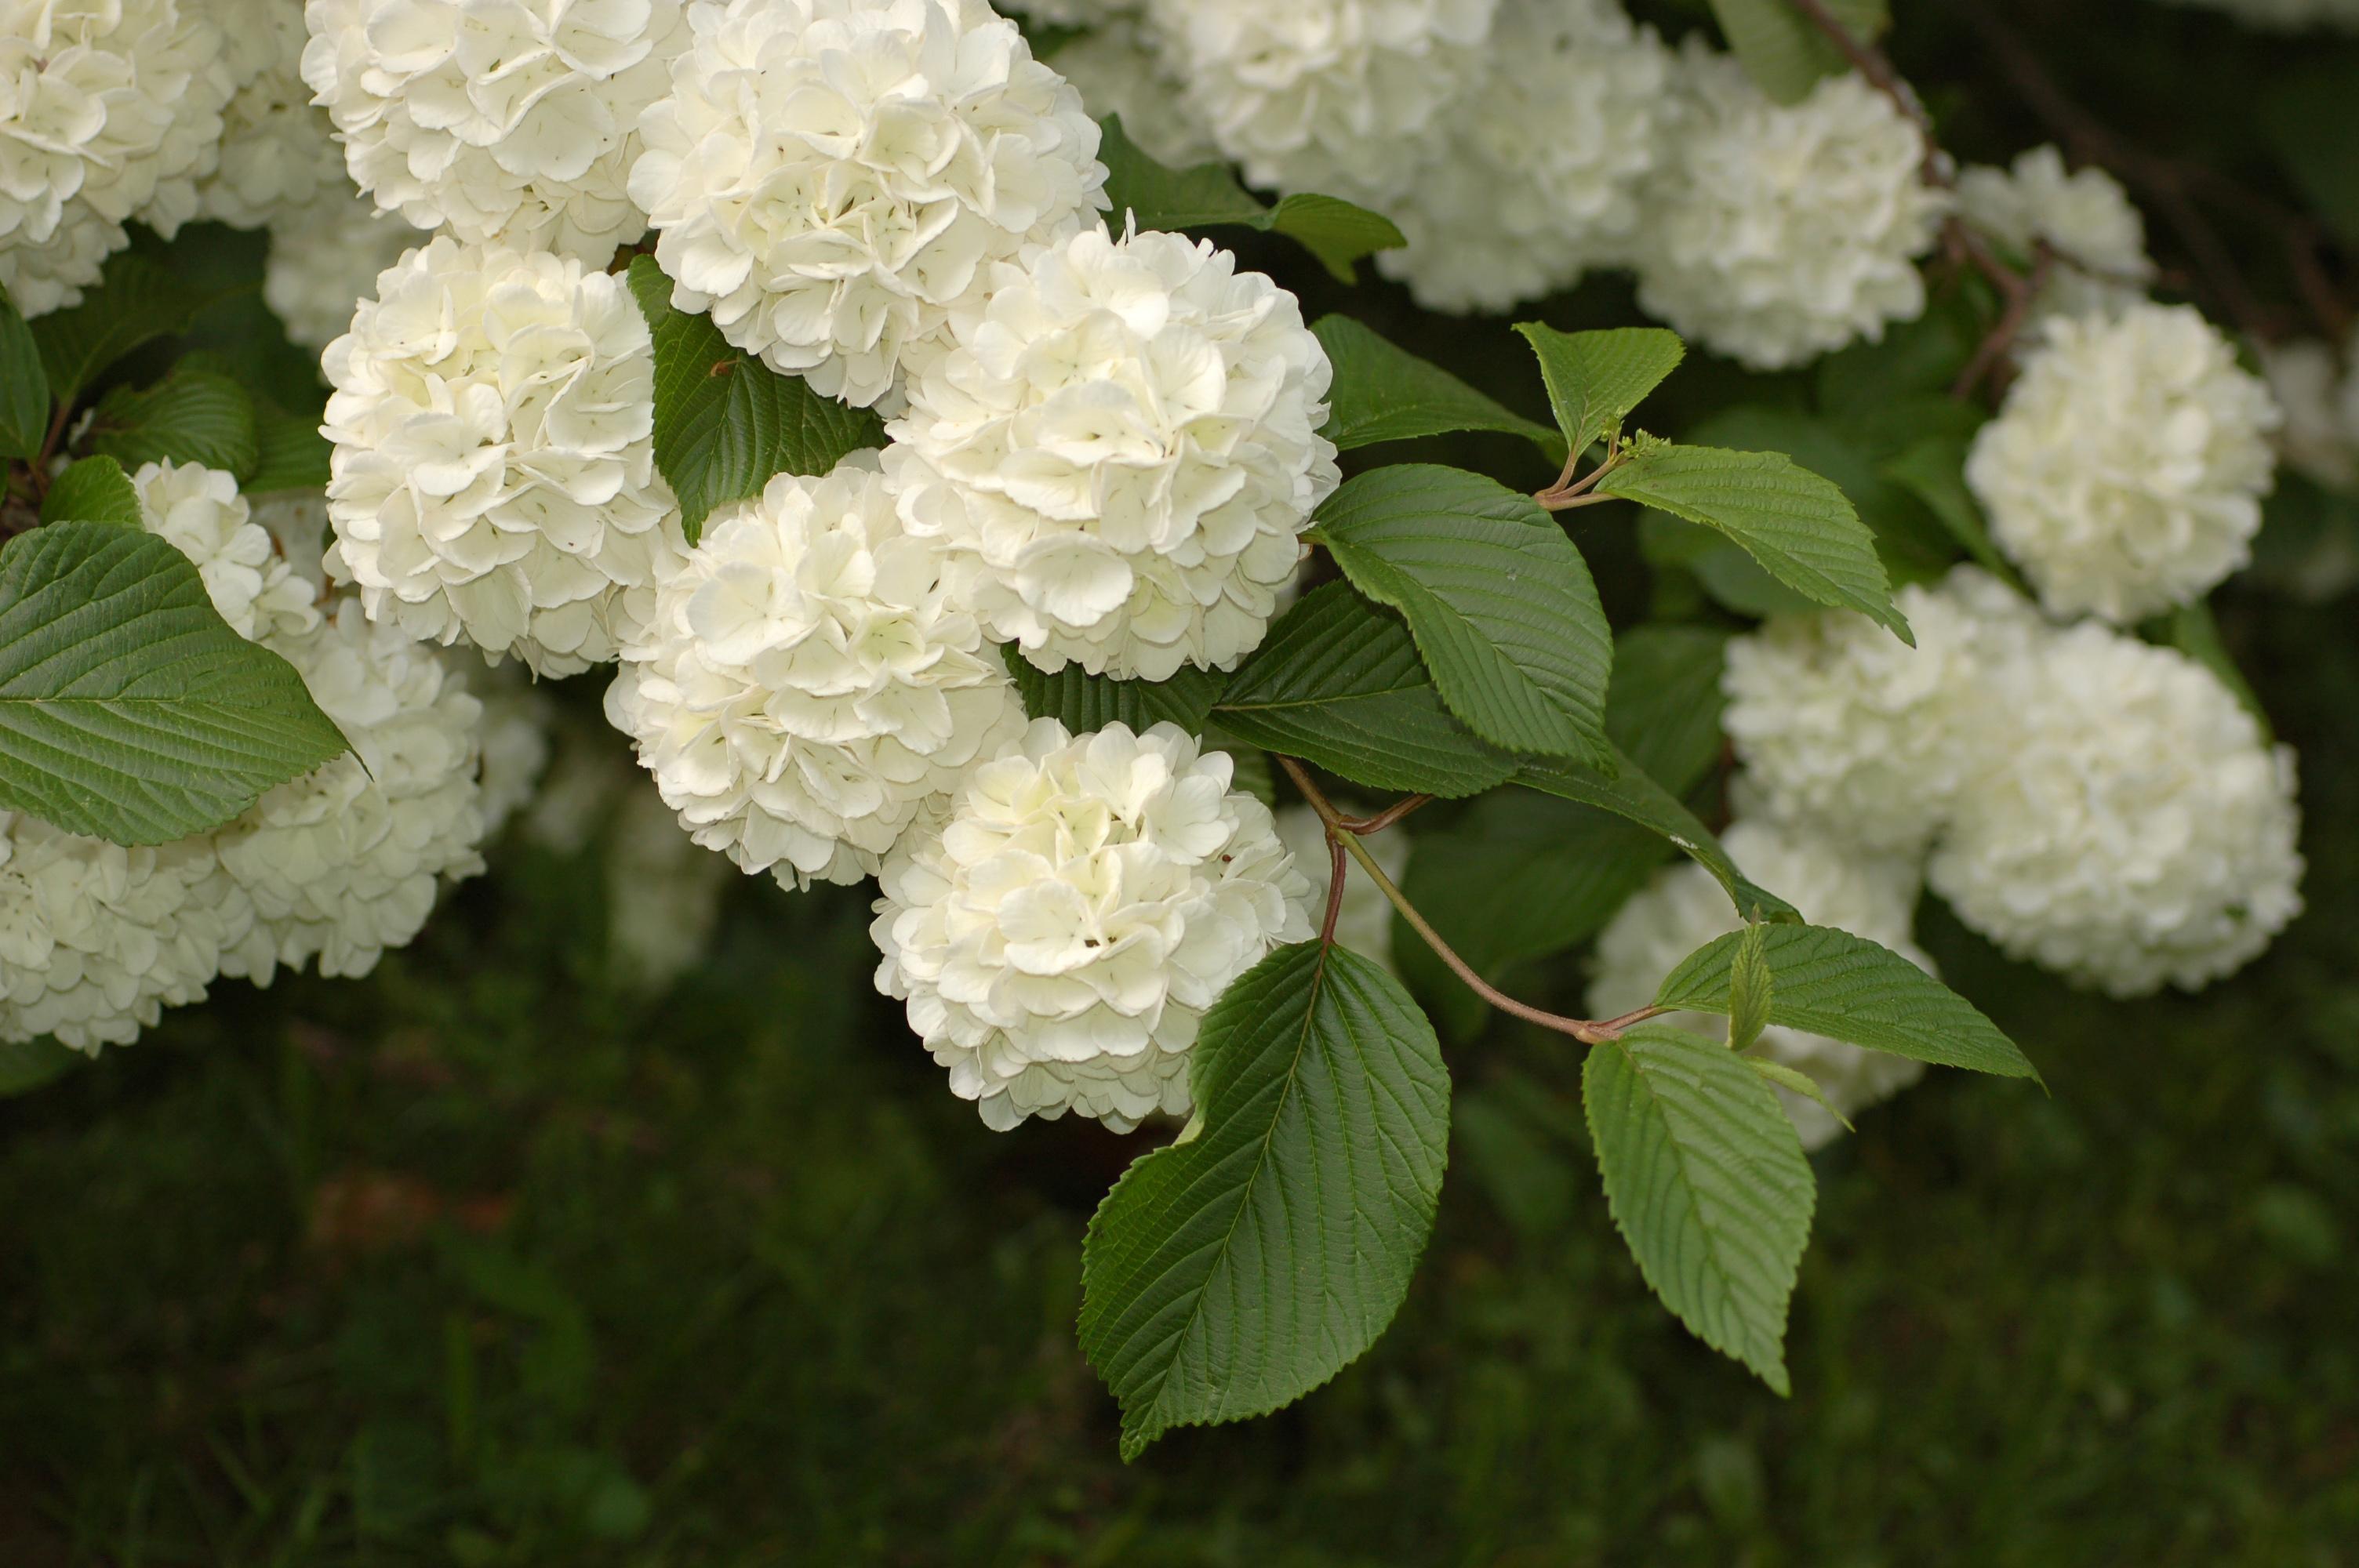 Filesnowball Viburnum Viburnum Plicatum Flowers 2g Wikimedia